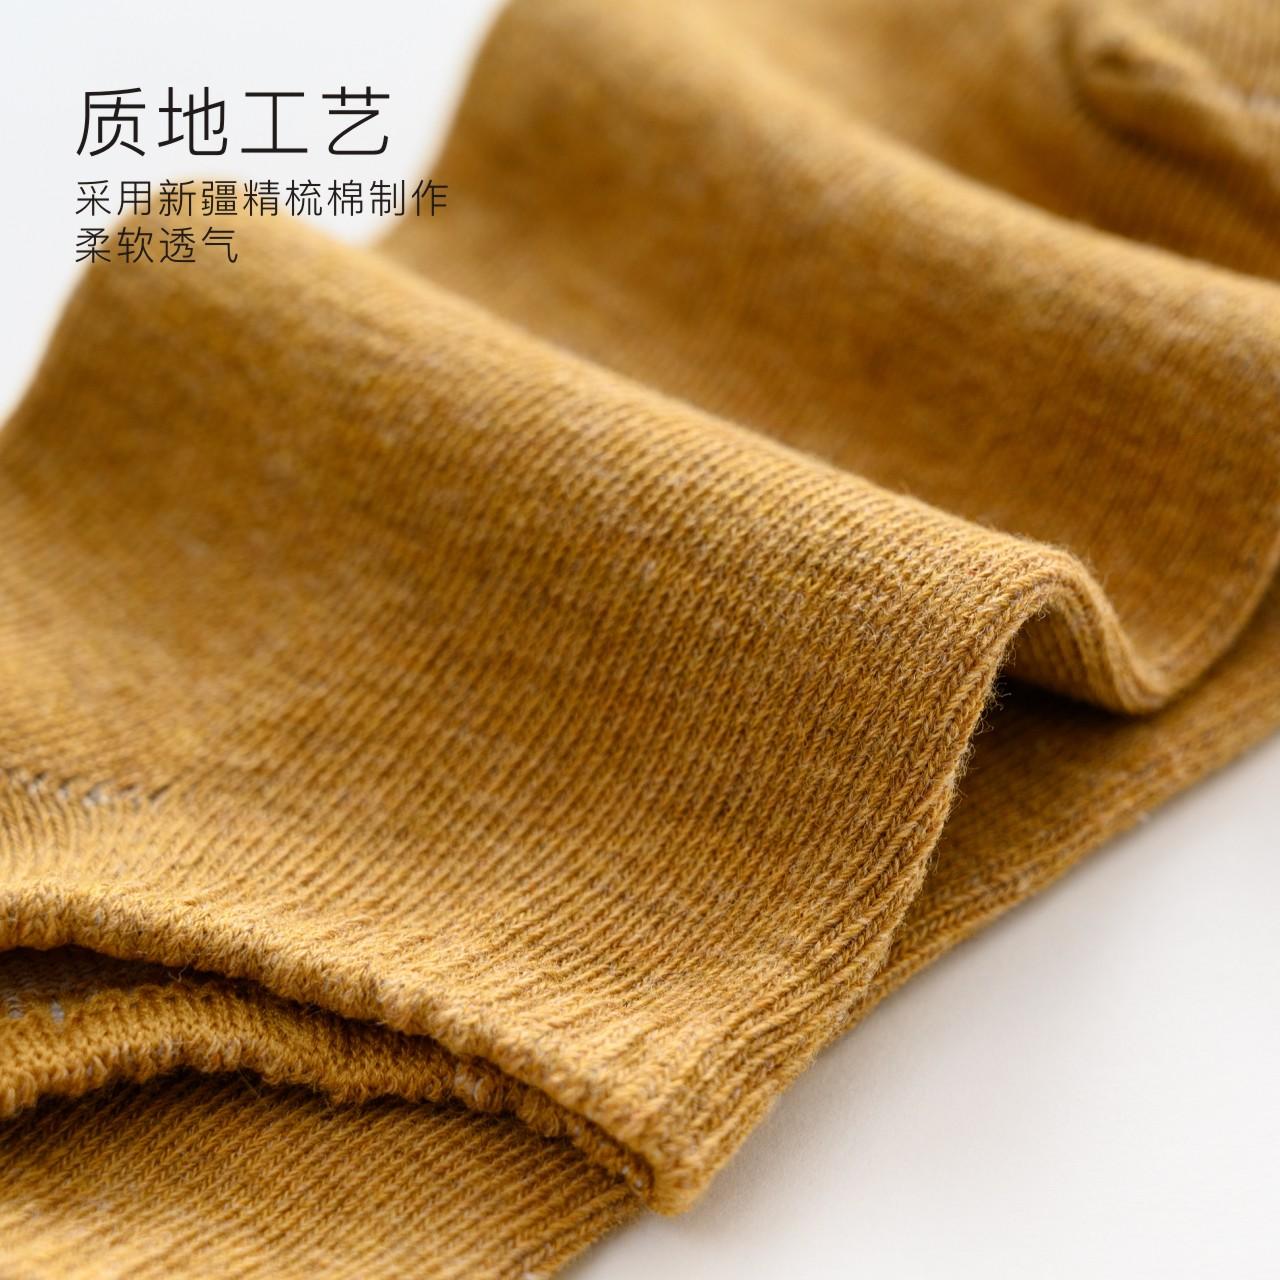 CARAMELLA袜子女春夏船袜可爱卡通韩版学院风隐形袜短袜浅口棉袜